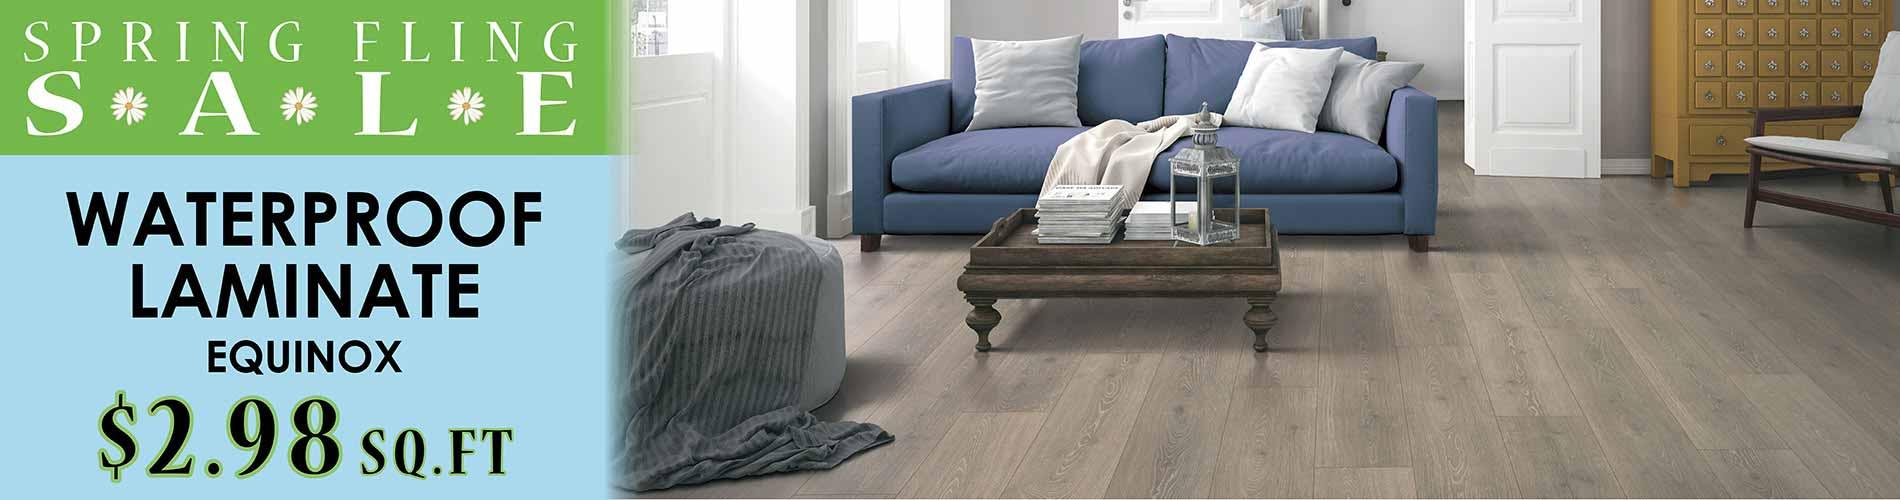 Equinox Waterproof Laminate Flooring starting at $2.98 during our Spring Fling Sale at Floor Express in Tumwater, WA